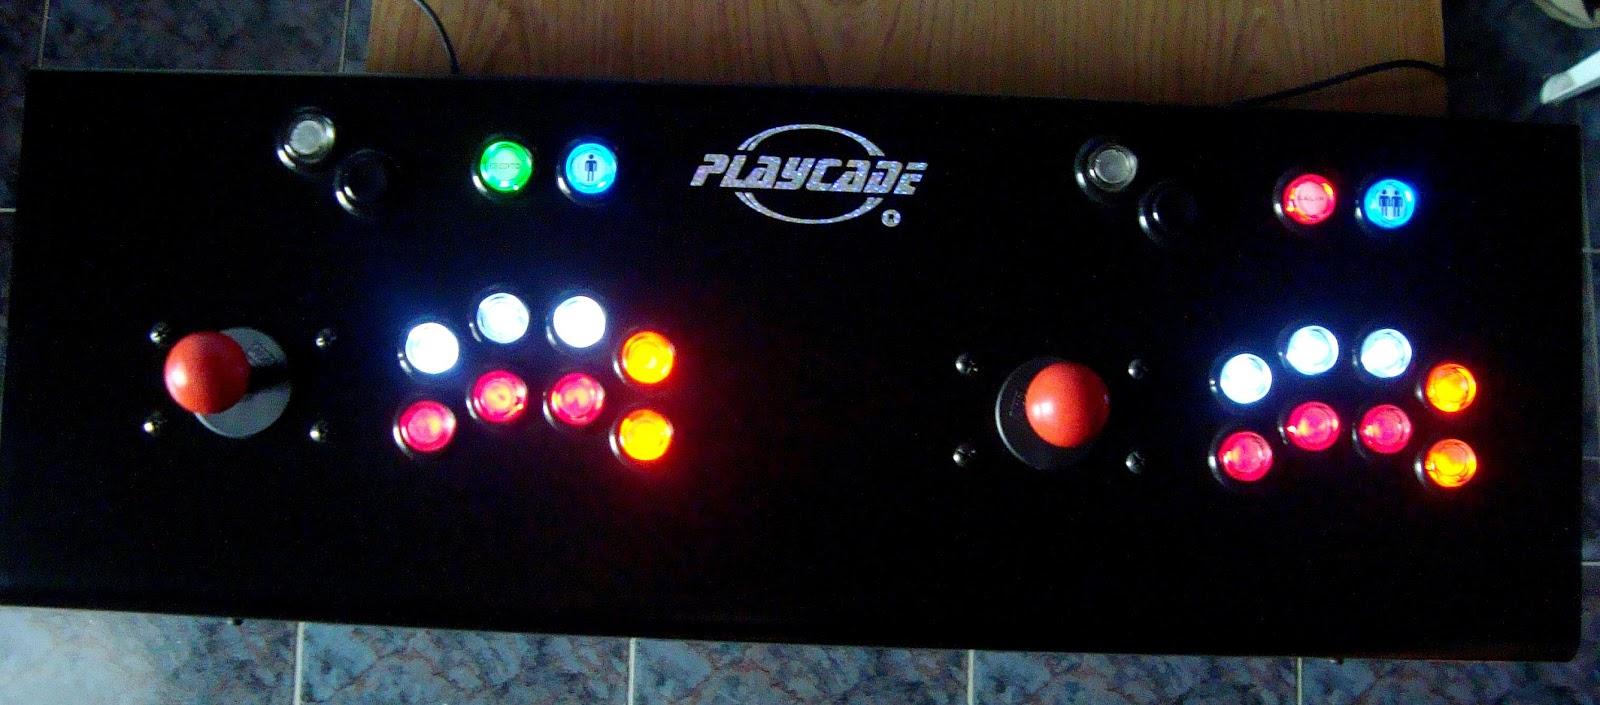 JOYSTICK ARCADE MAME PLAYCADE TWIN ARCOIRIS, USB, 2 JUGADORES